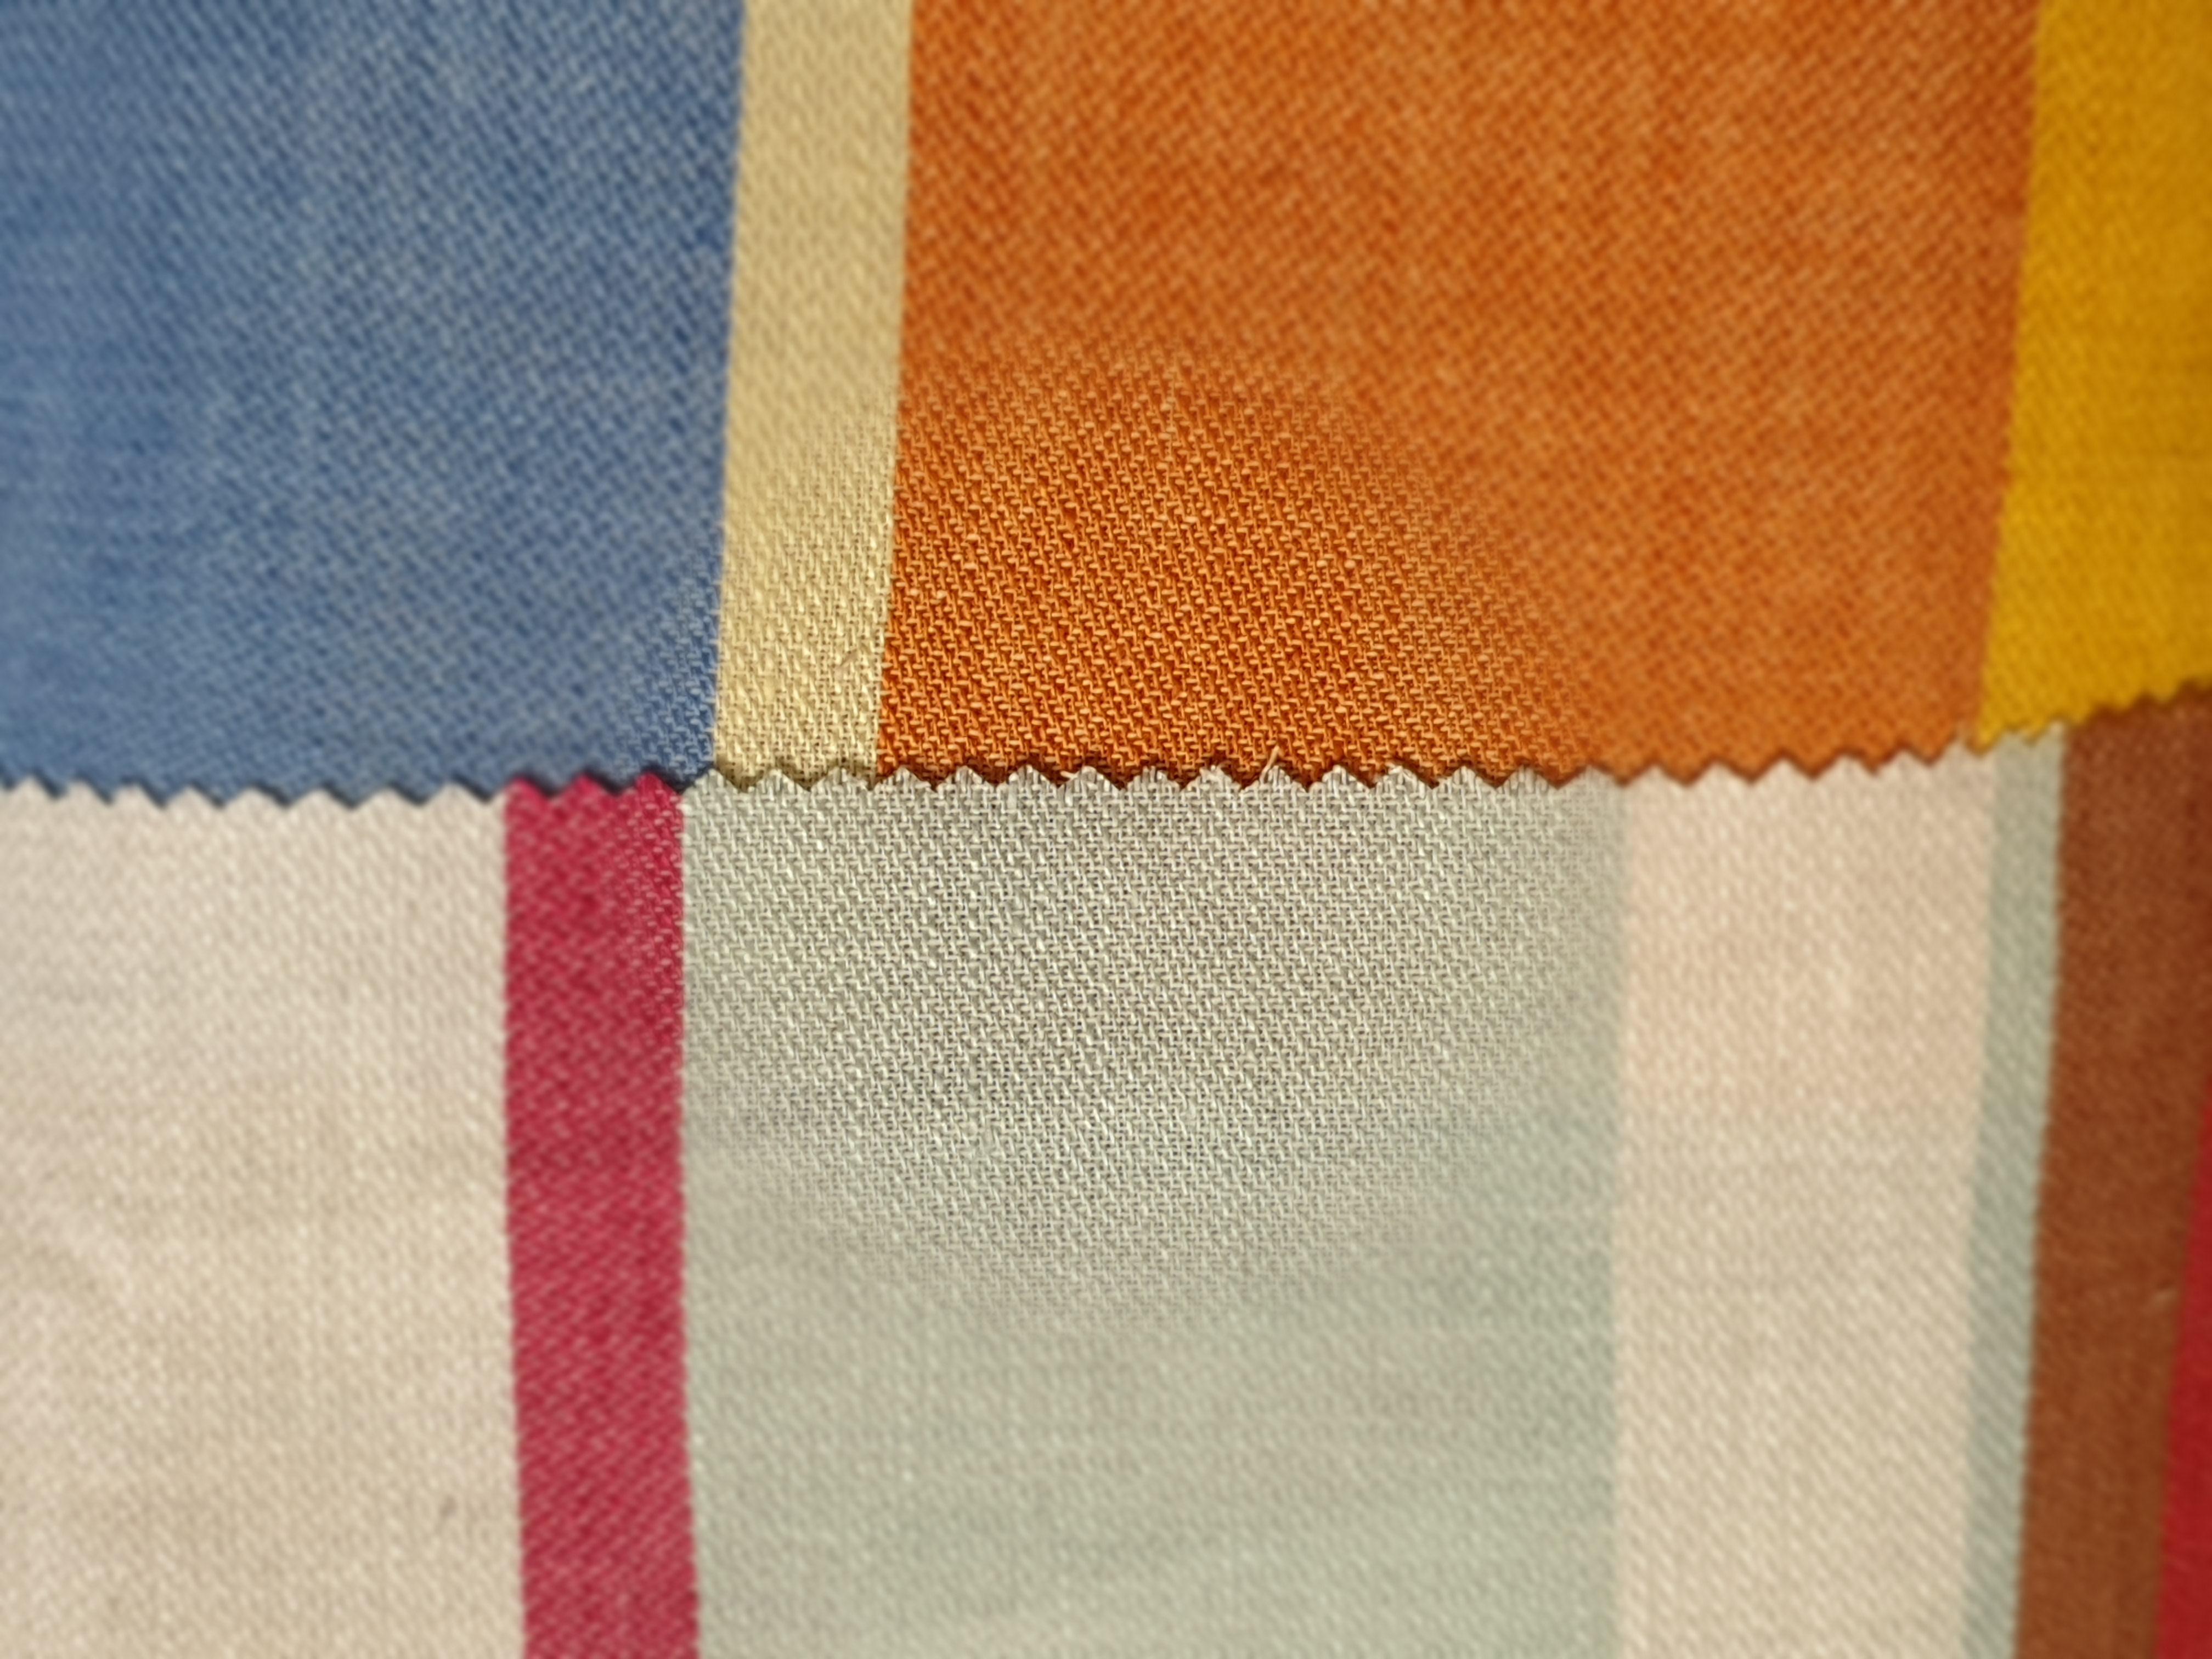 ART 7495 WIDTH cm145 WEIGHT gr220 - gr151 square meter - COMPOSITION 58 linen 42 cotton - blue 200mts – pink 450mts